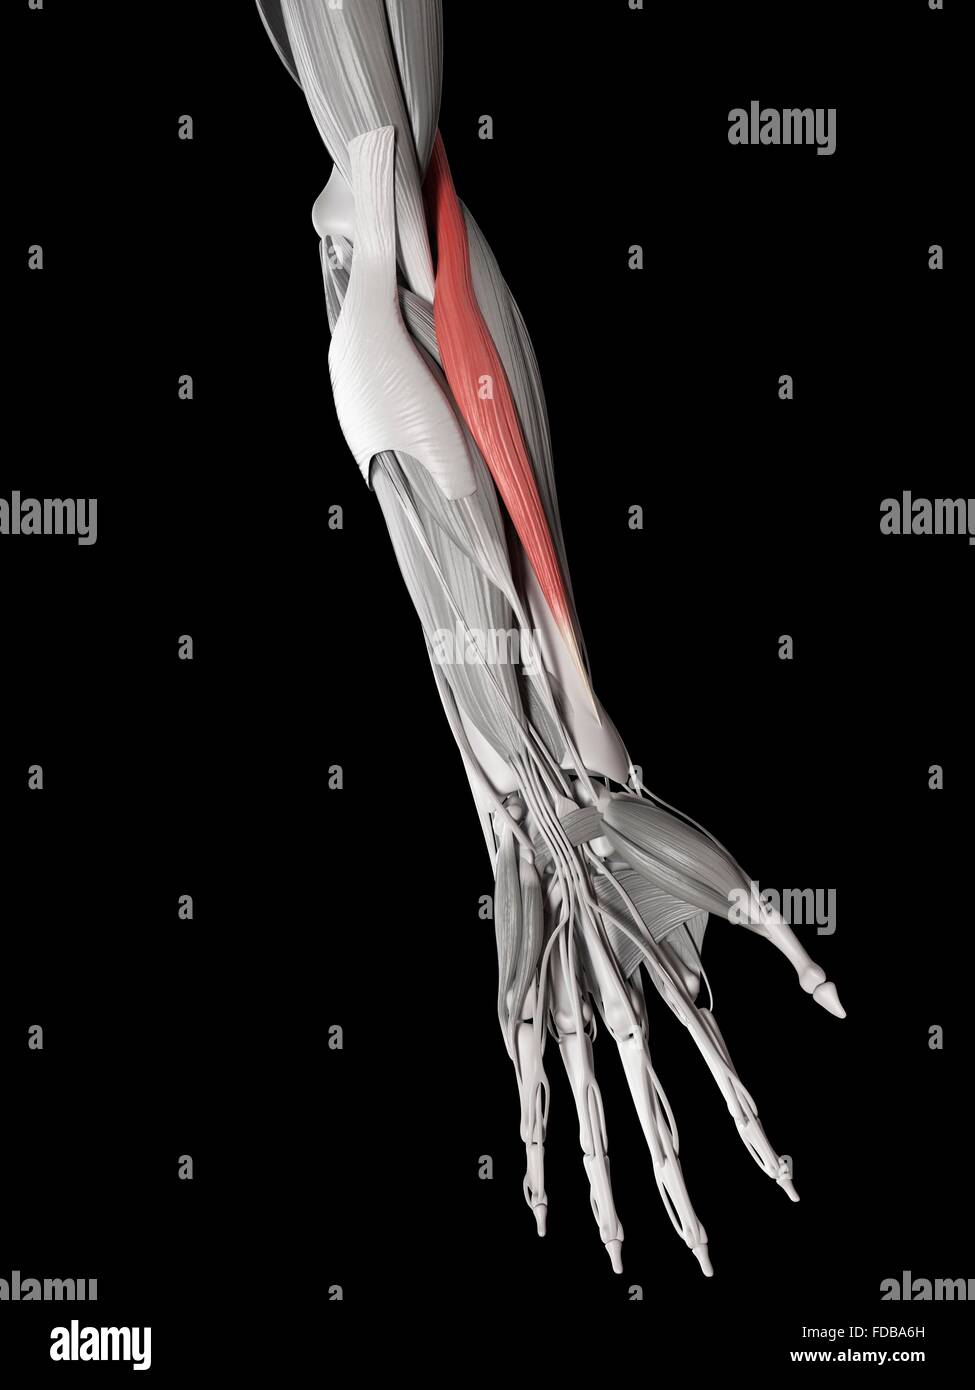 Le muscle humain du bras (brachioradialis), illustration. Photo Stock